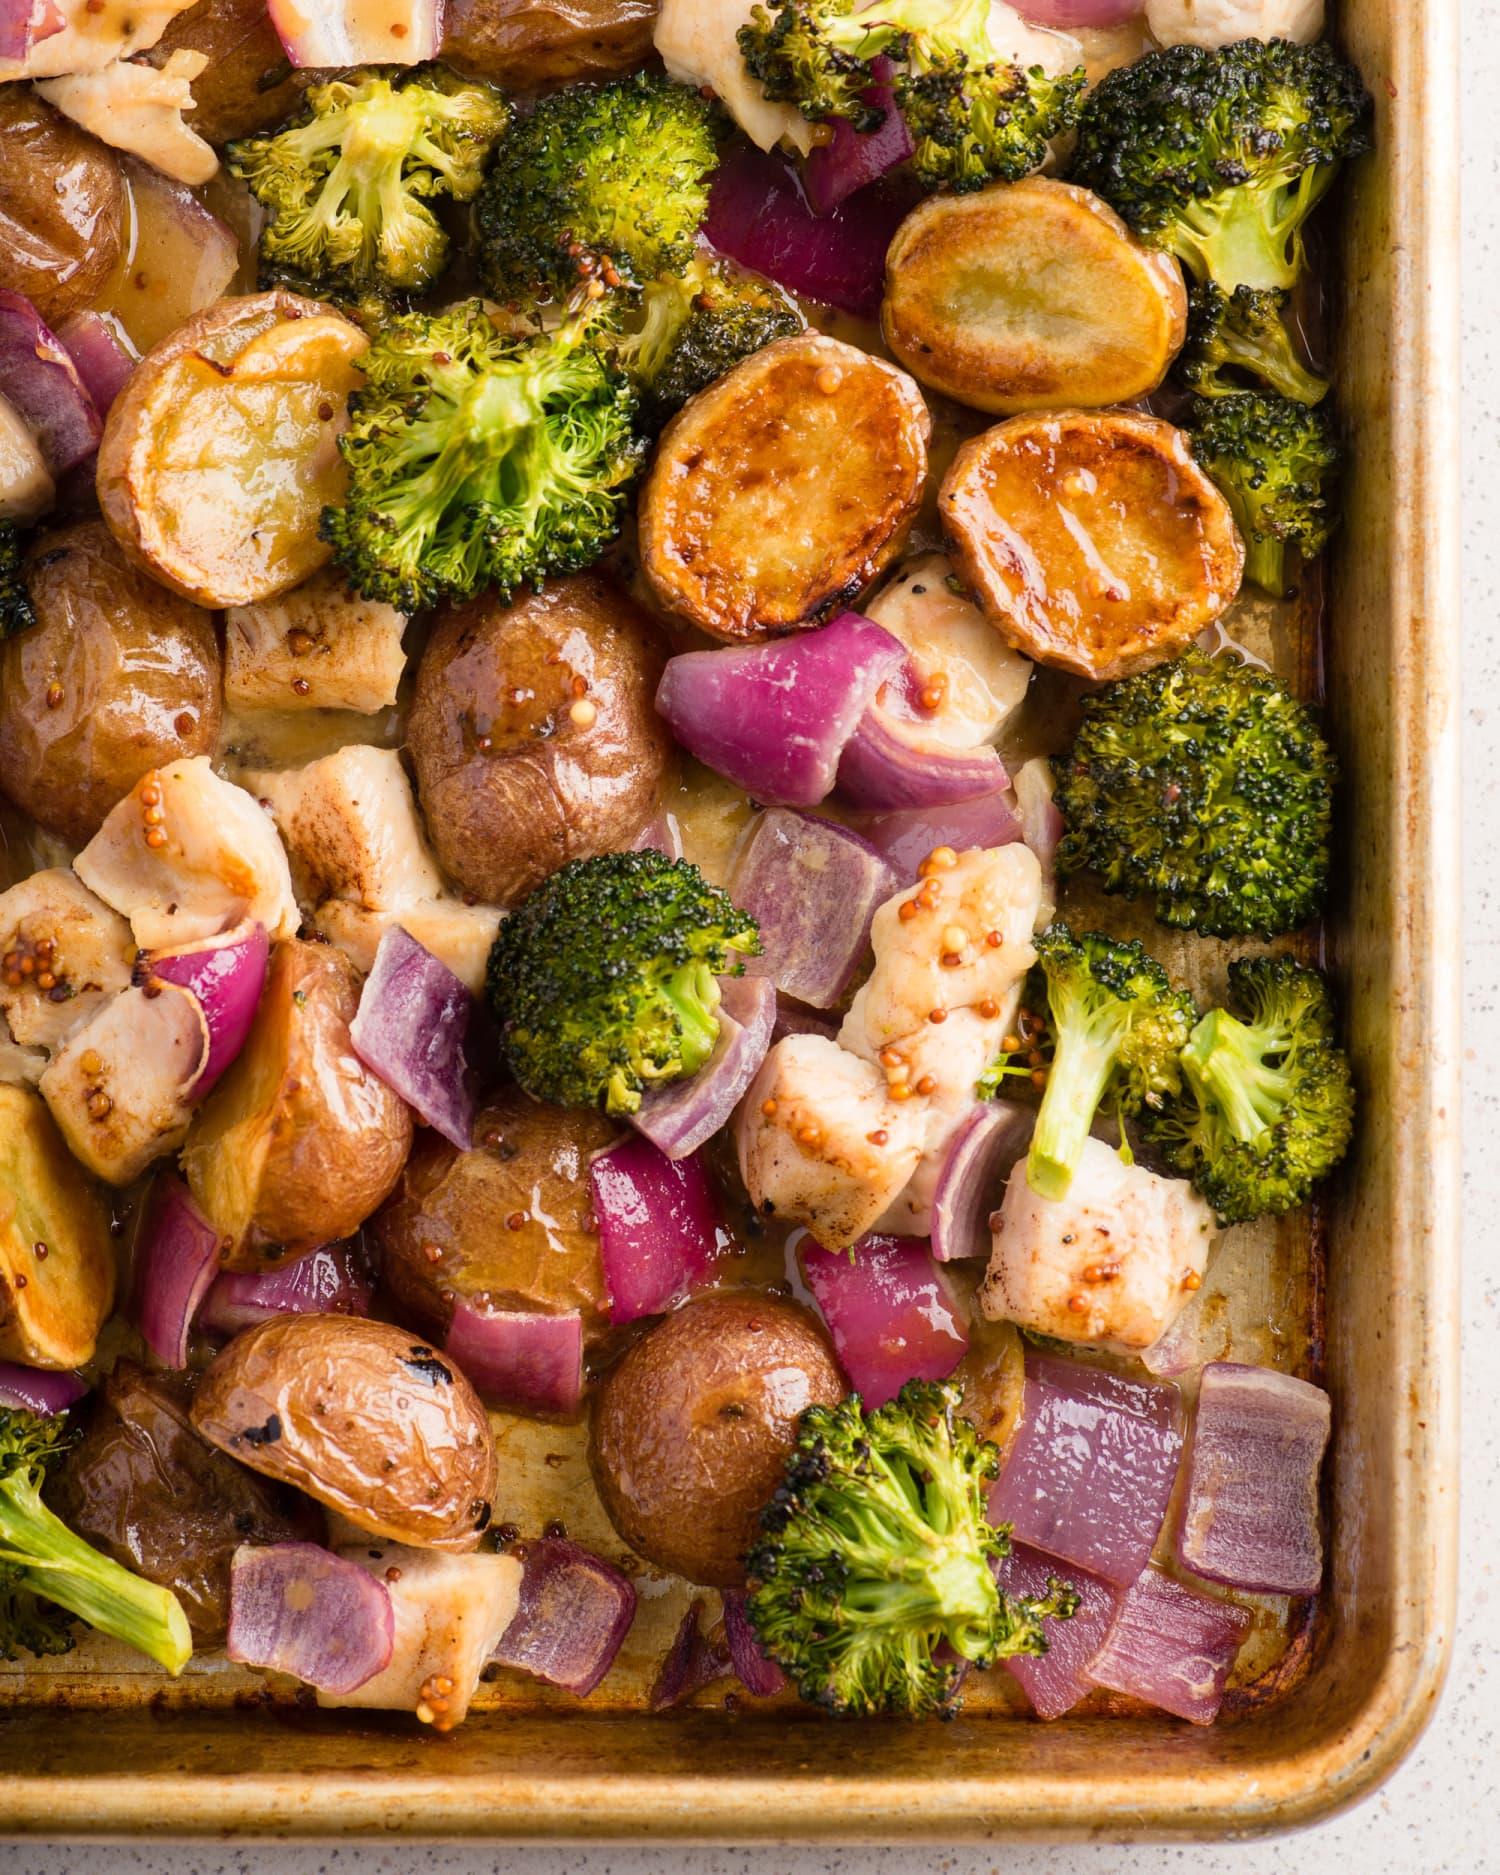 Recipe: Sheet Pan Honey-Dijon Chicken and Vegetables